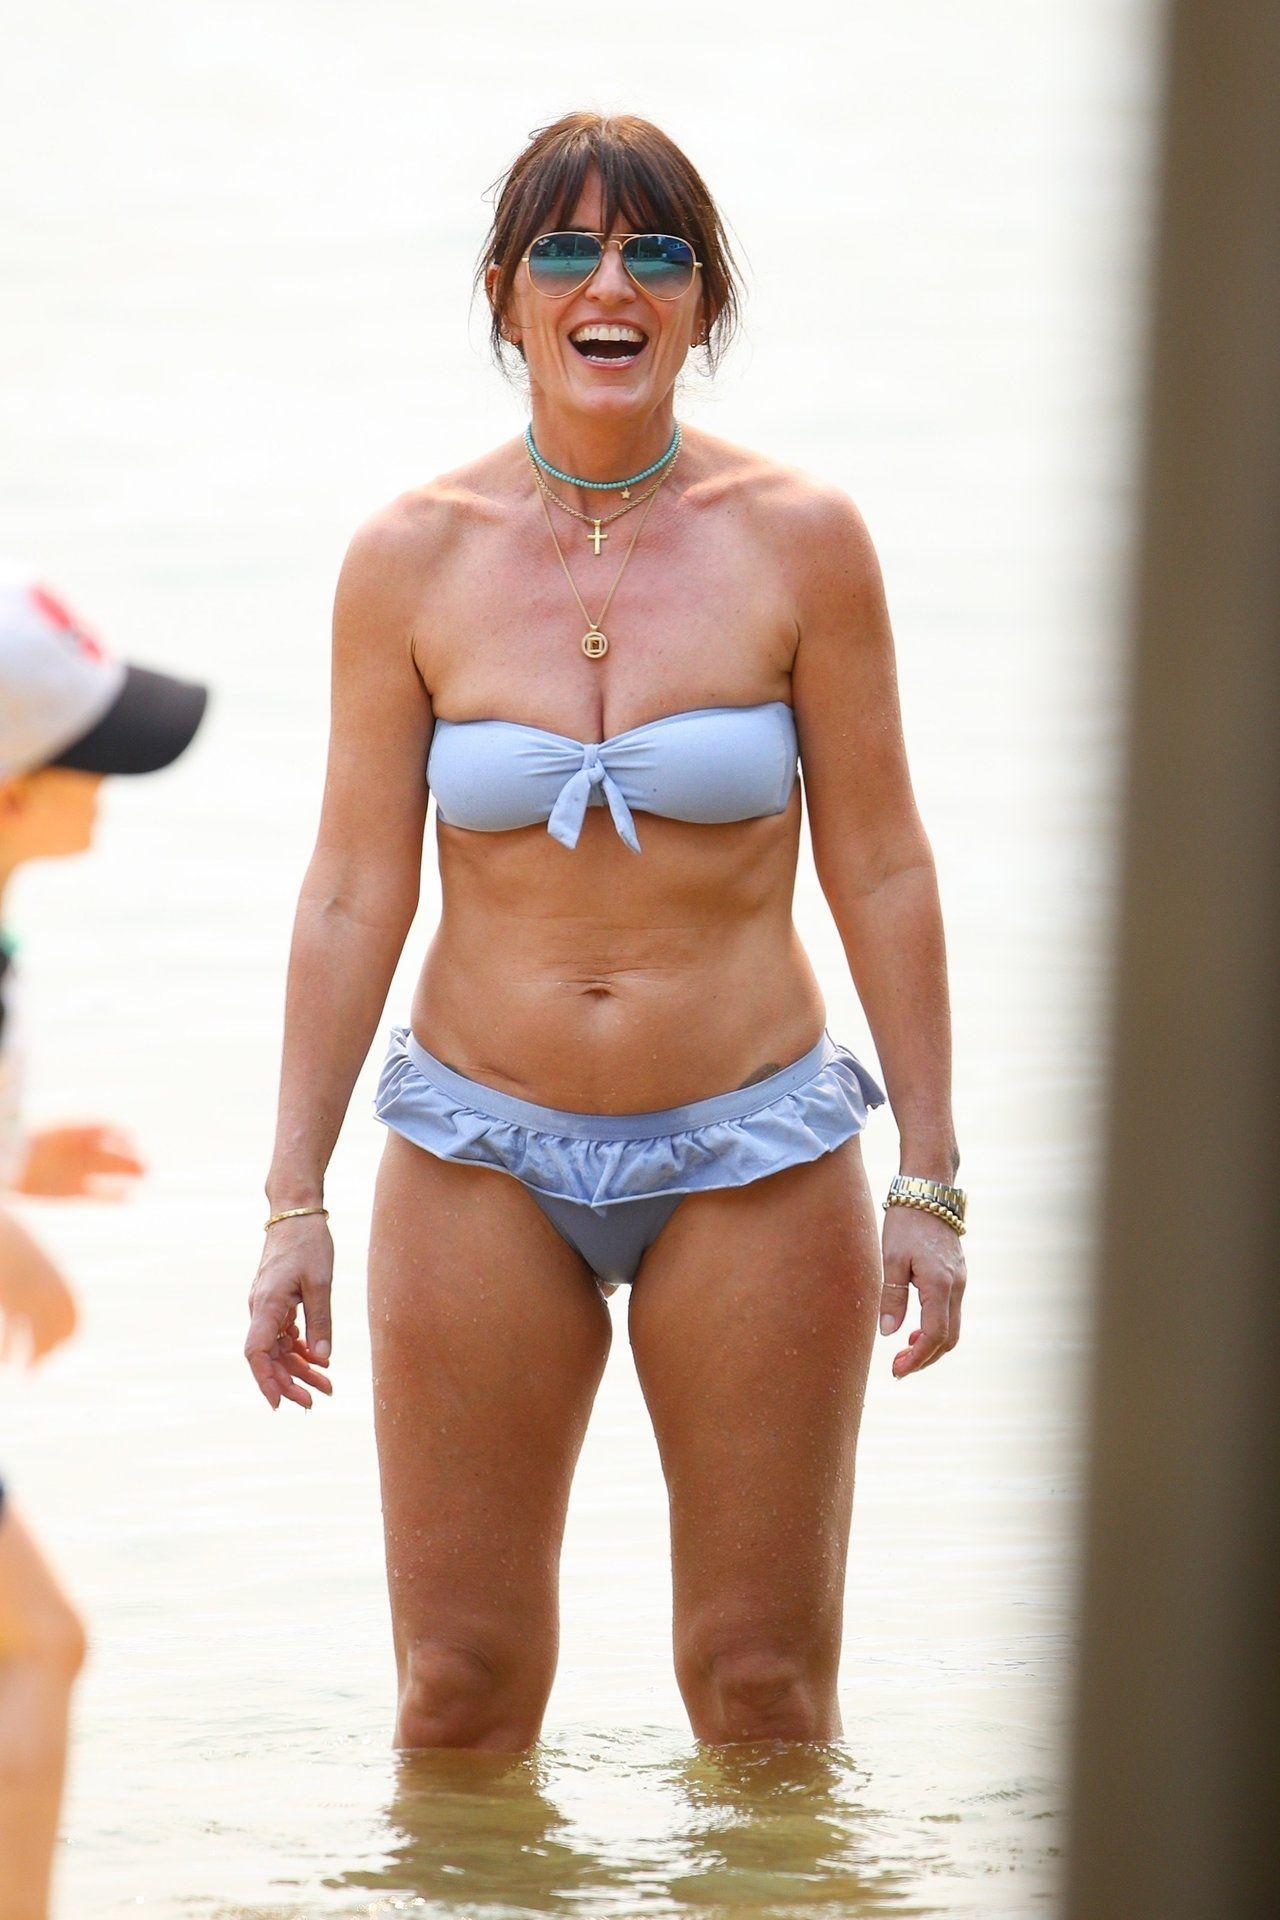 Davina mccall bikini Who is Davina McCall's